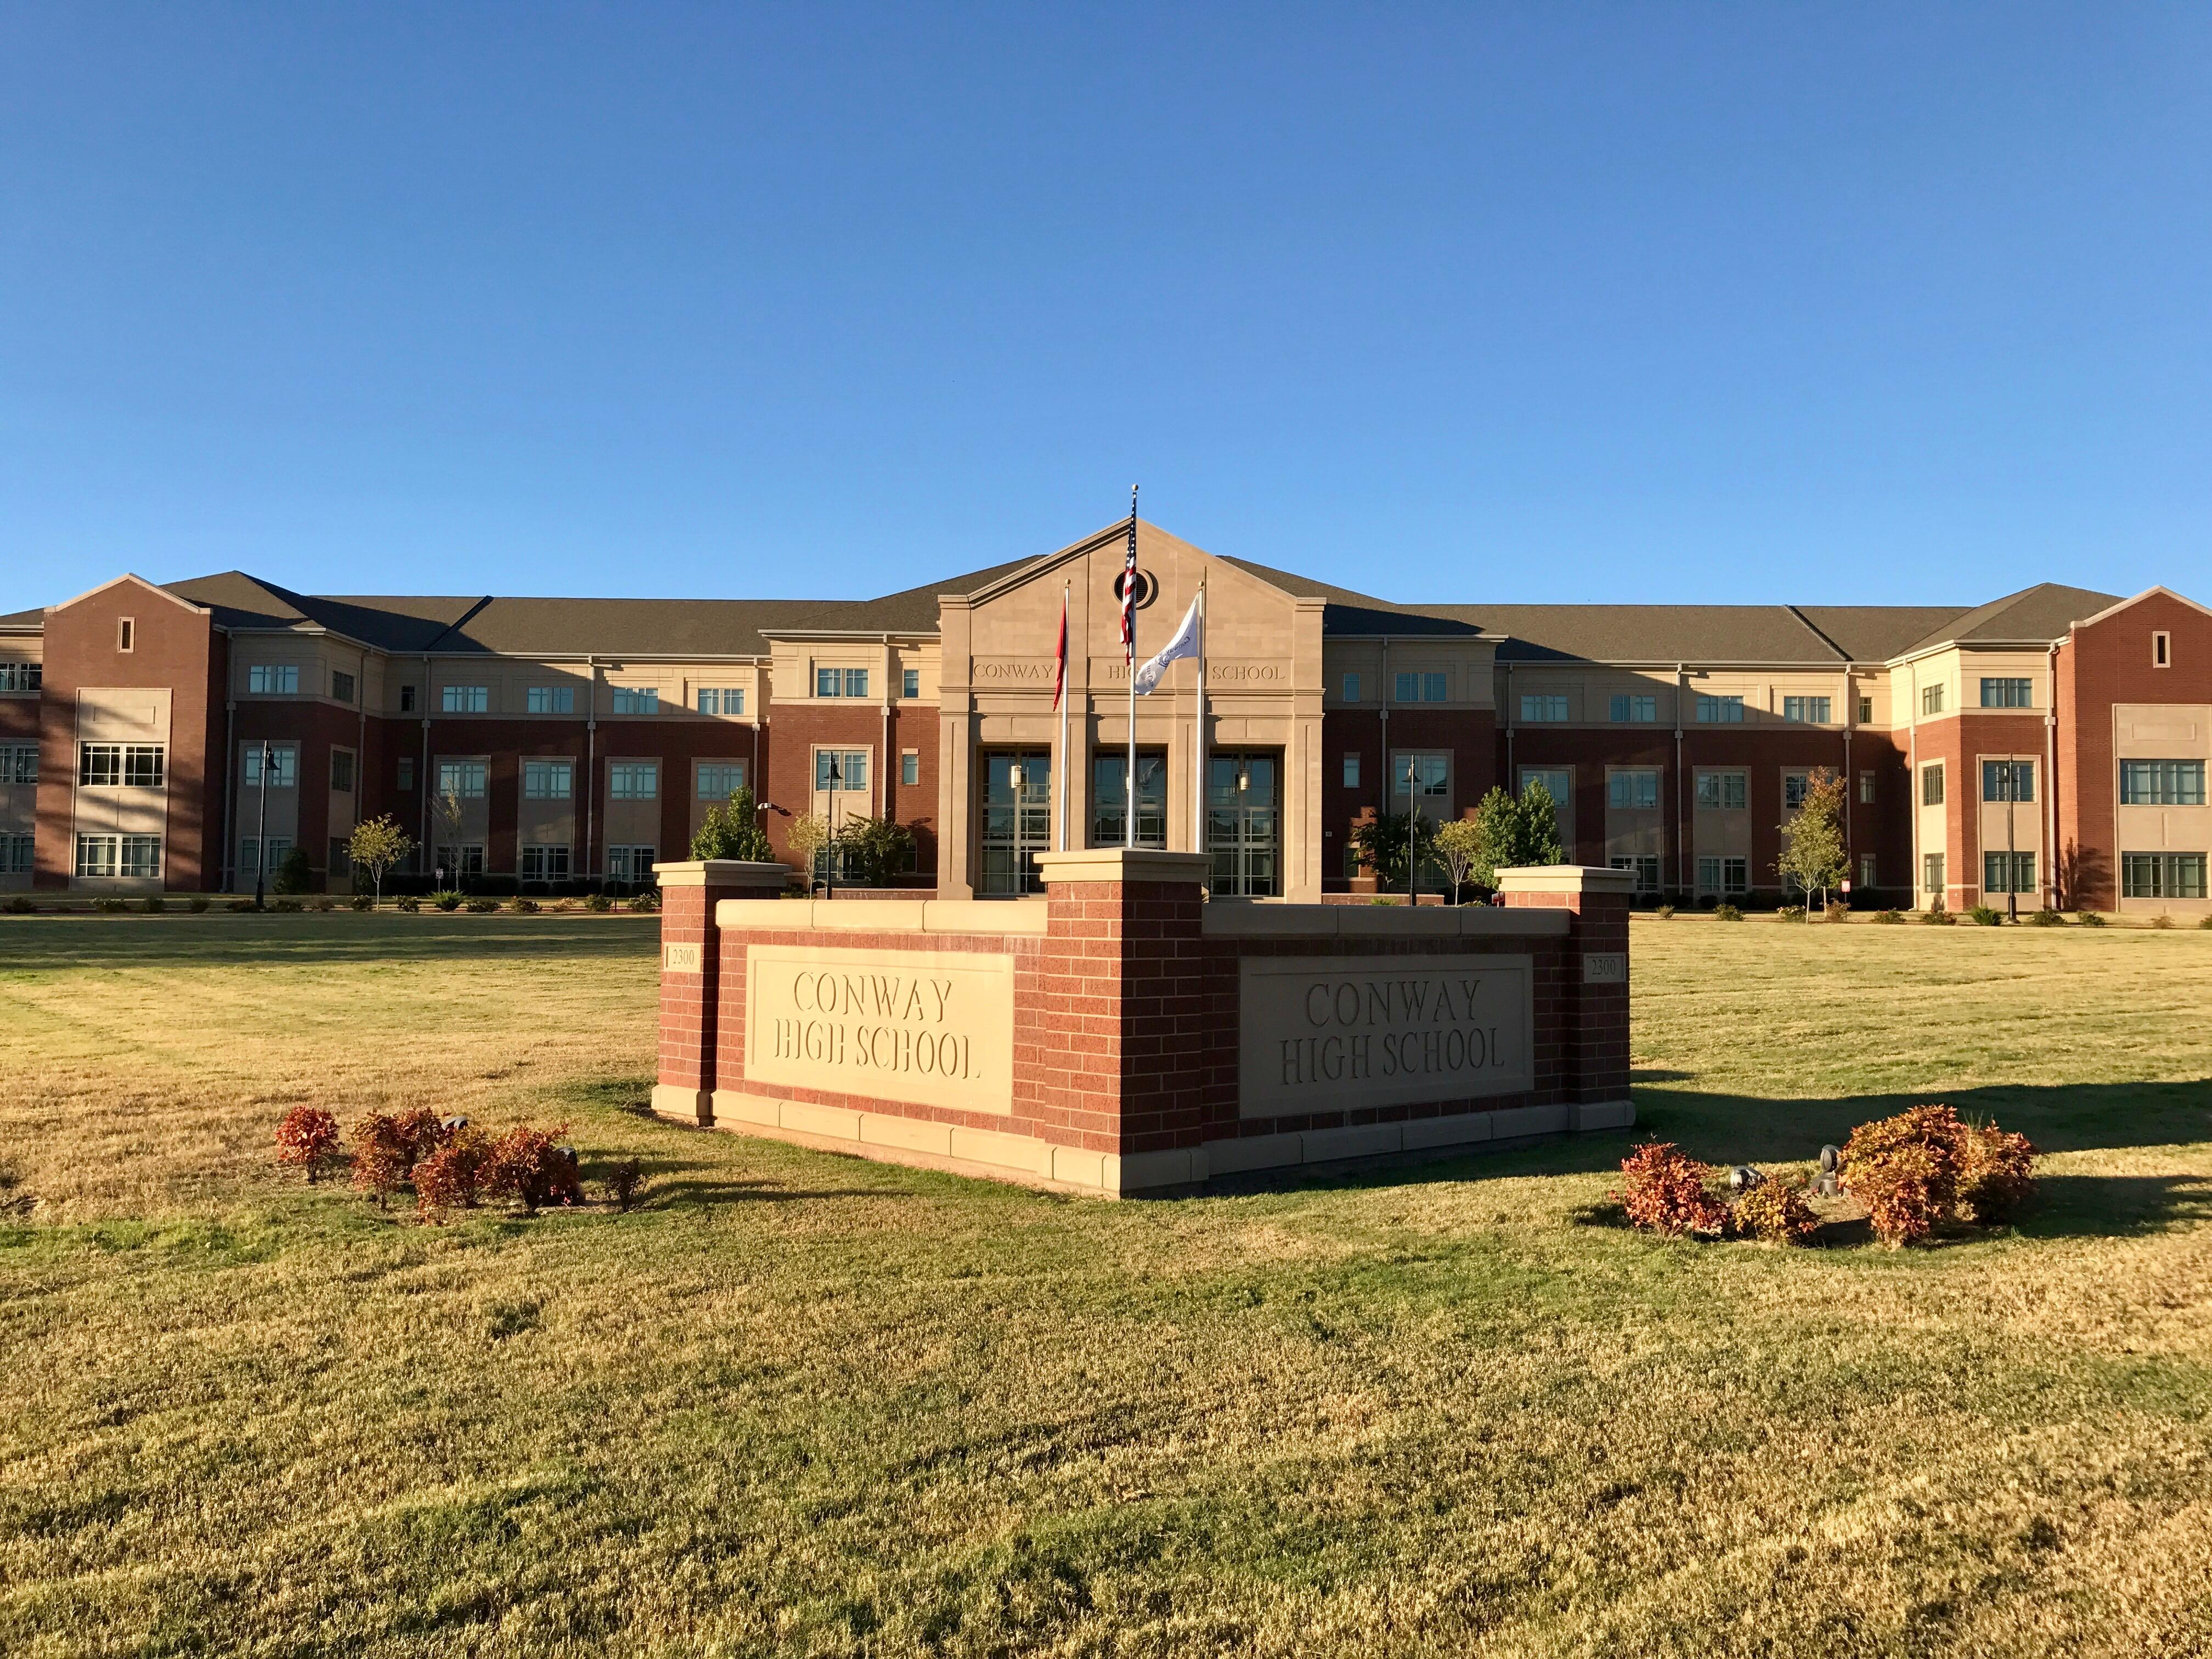 Conway High School Arkansas Wikipedia